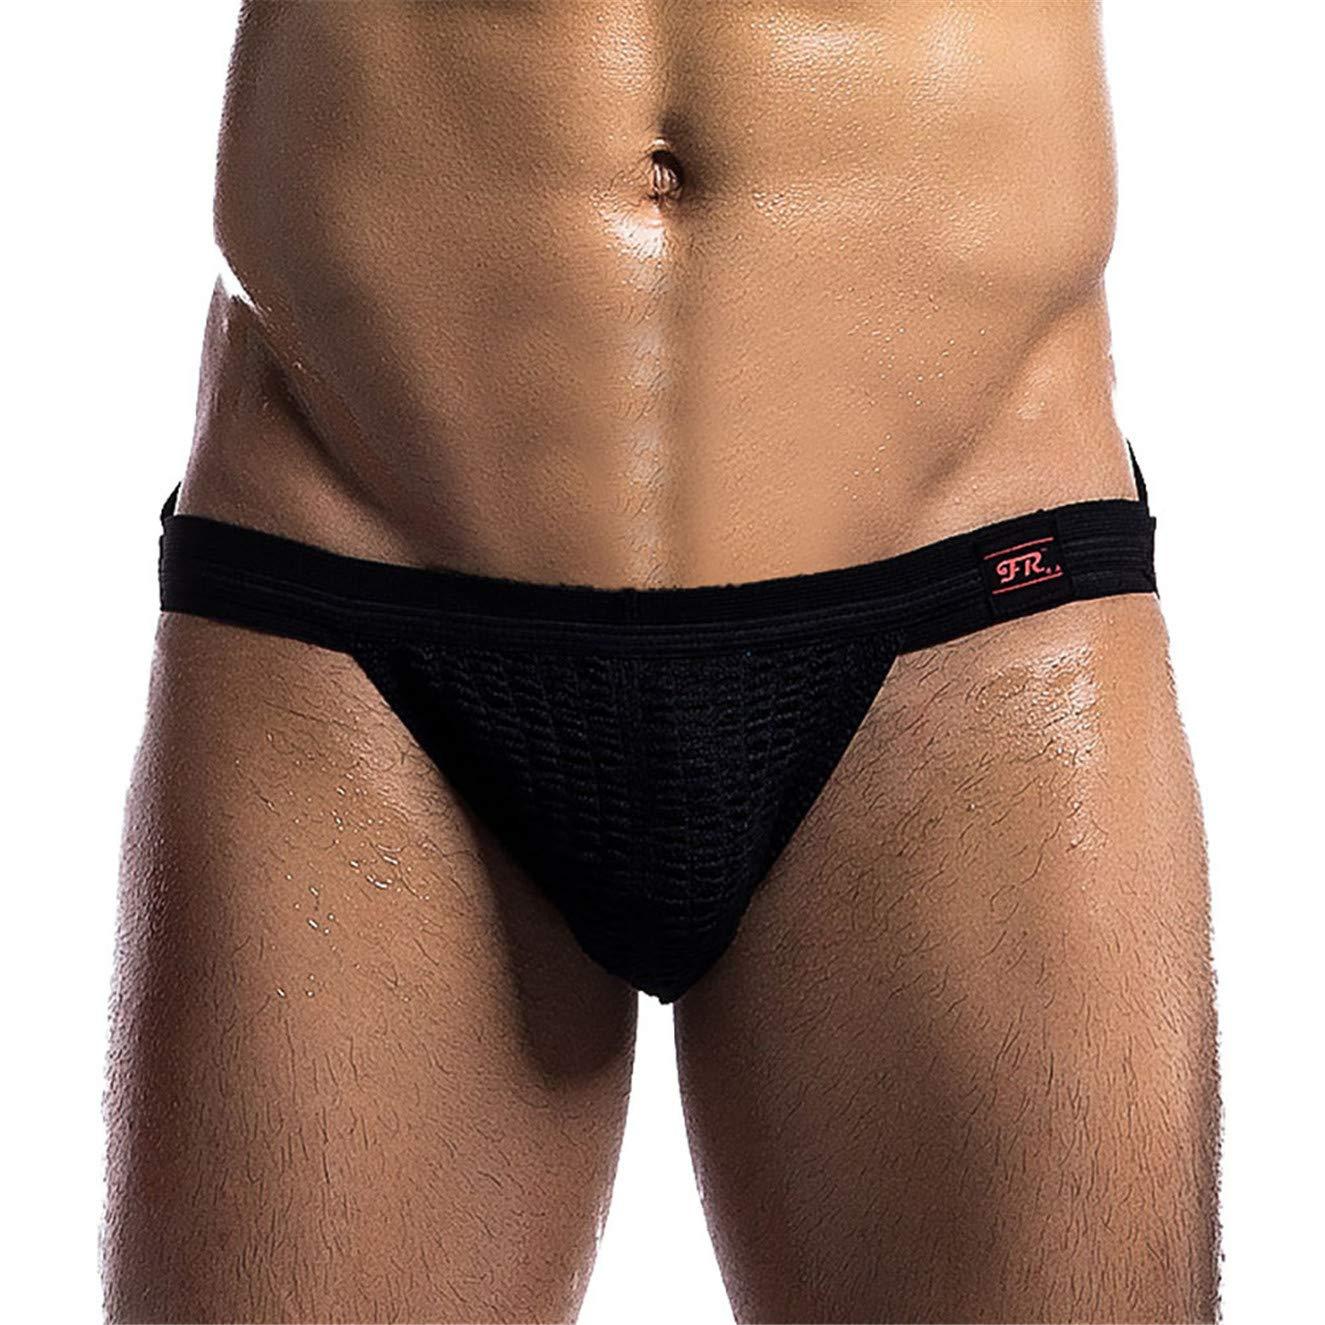 TIFENNY Men's Low-Waist Pure Ice-Silk Underwear Sexy Breathable Comfort Underpants